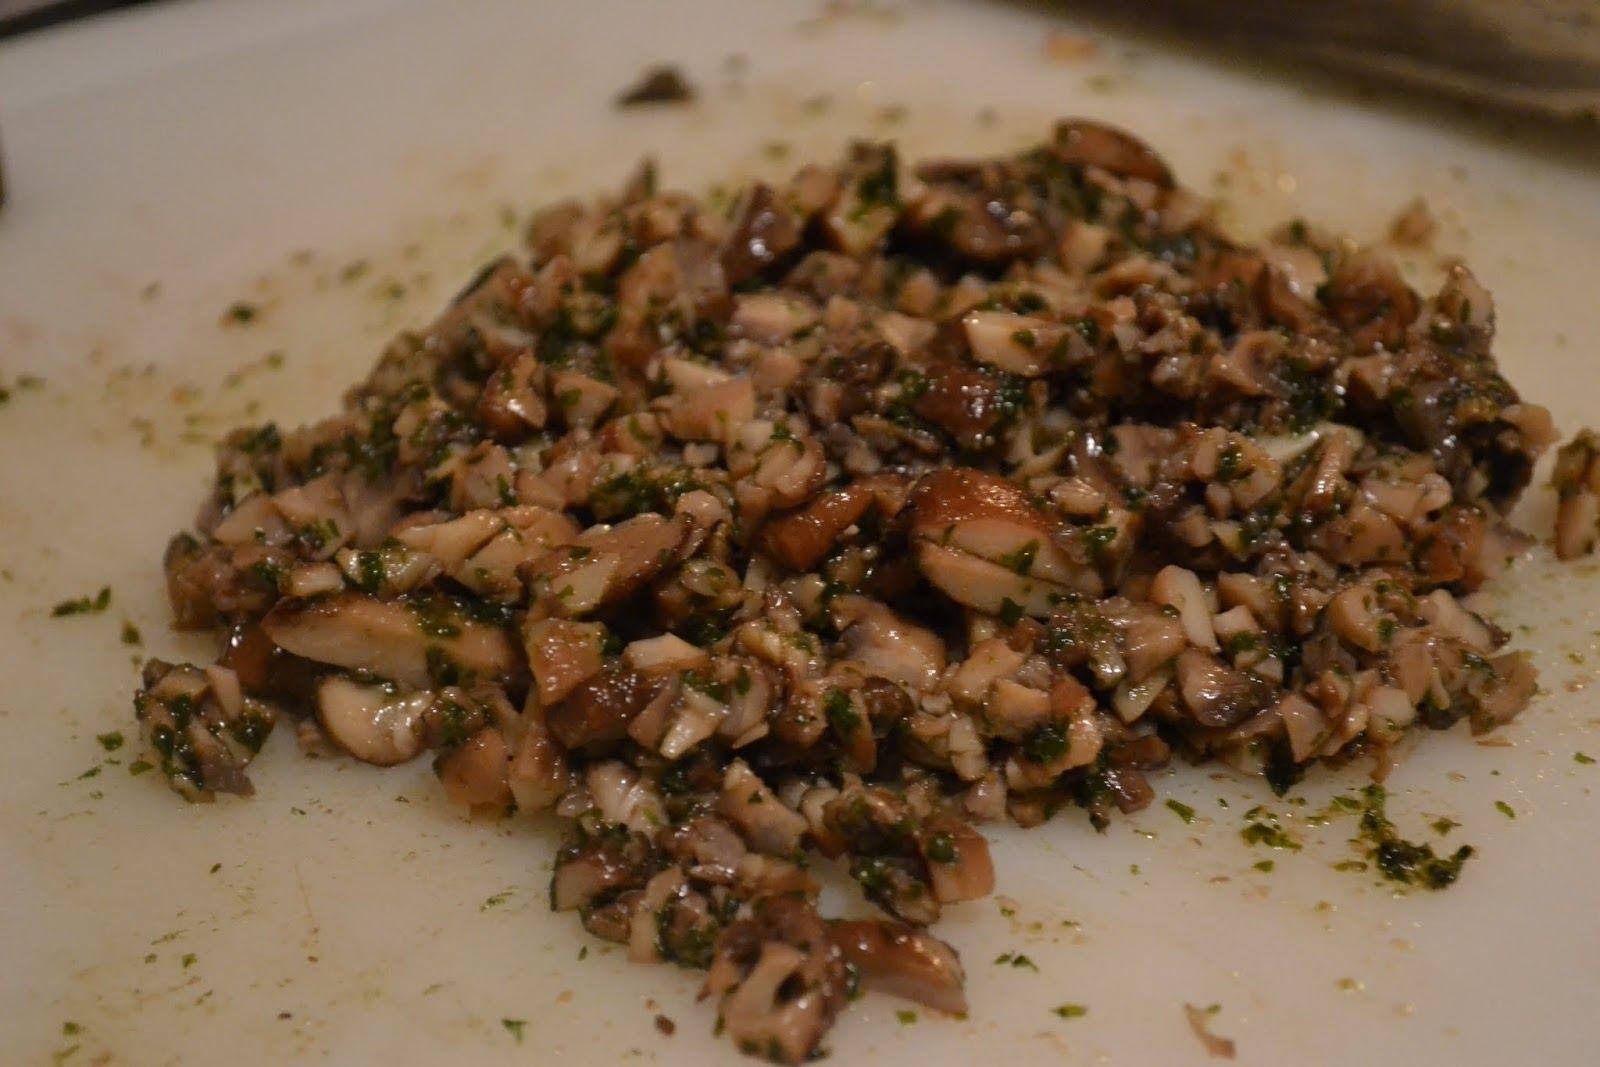 Much Ado About Somethin Mushroom Stuffed Sirloin